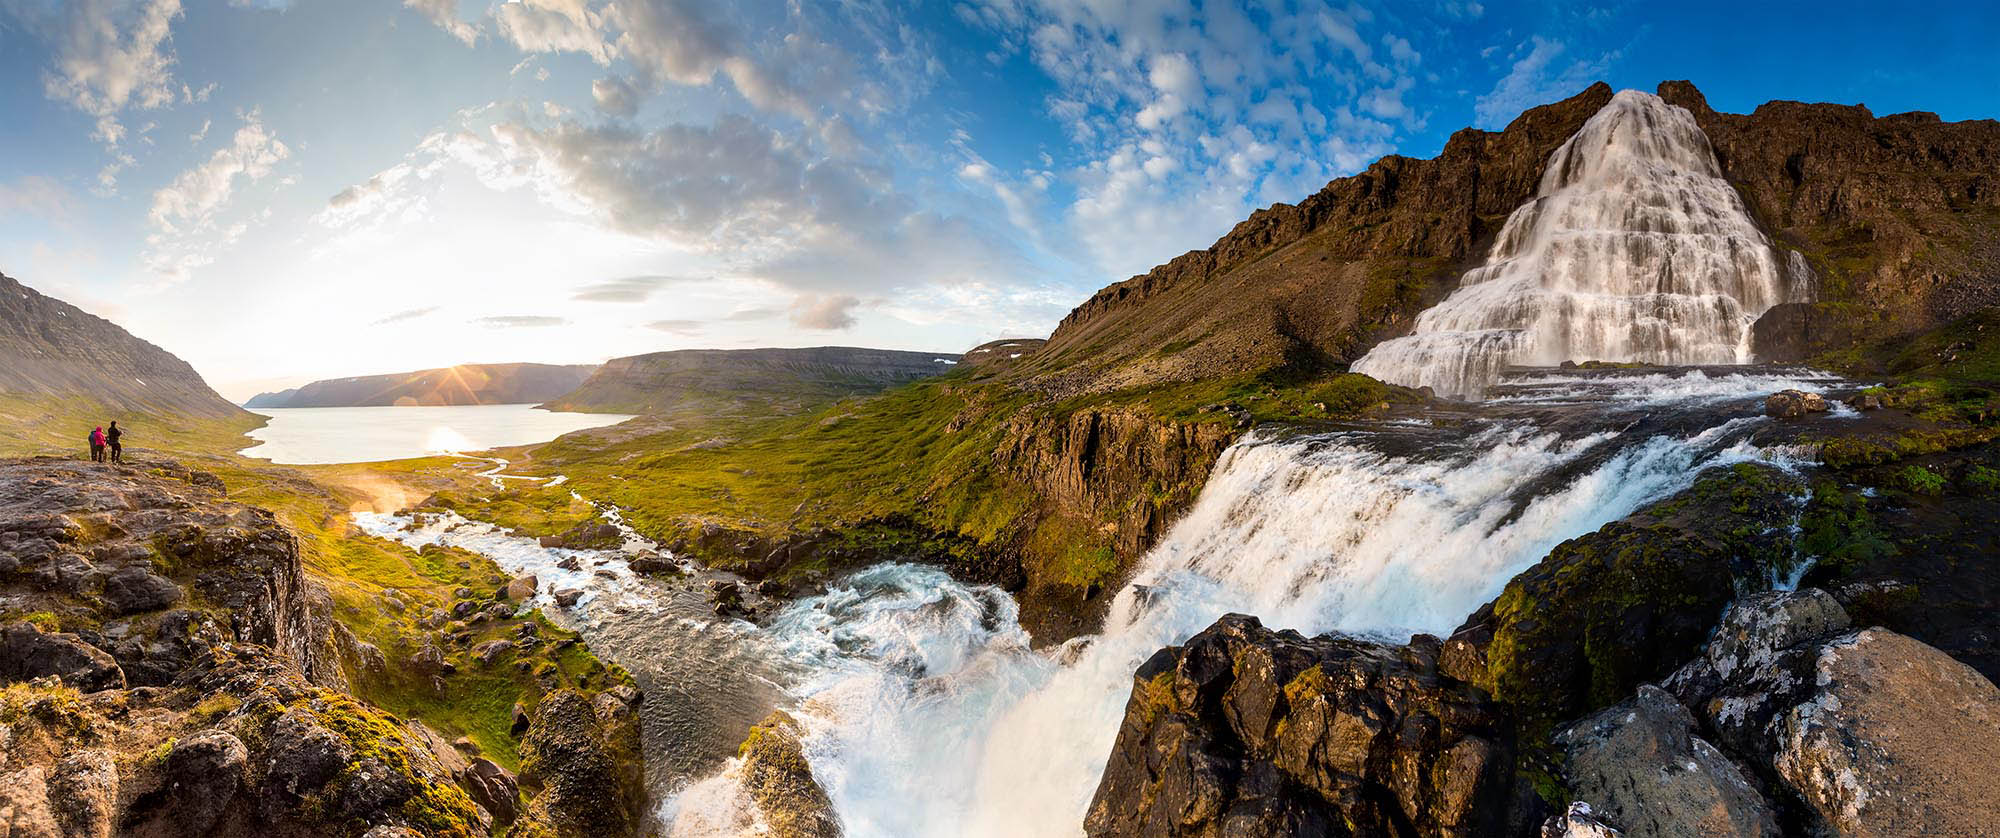 Dynjandi Waterfall - Iceland Full Circle - Westfjords